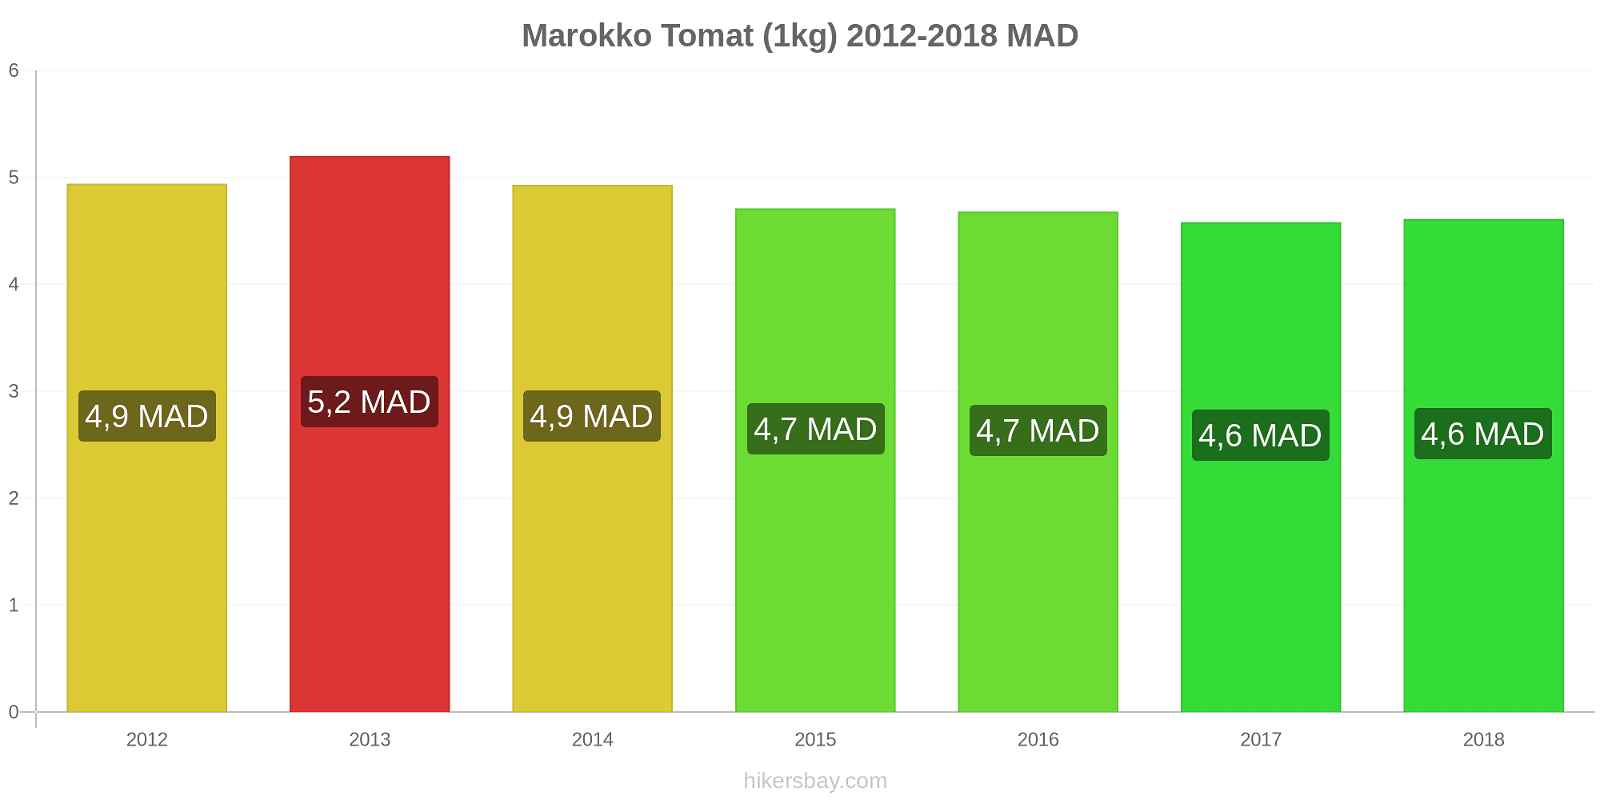 Marokko prisændringer Tomat (1kg) hikersbay.com